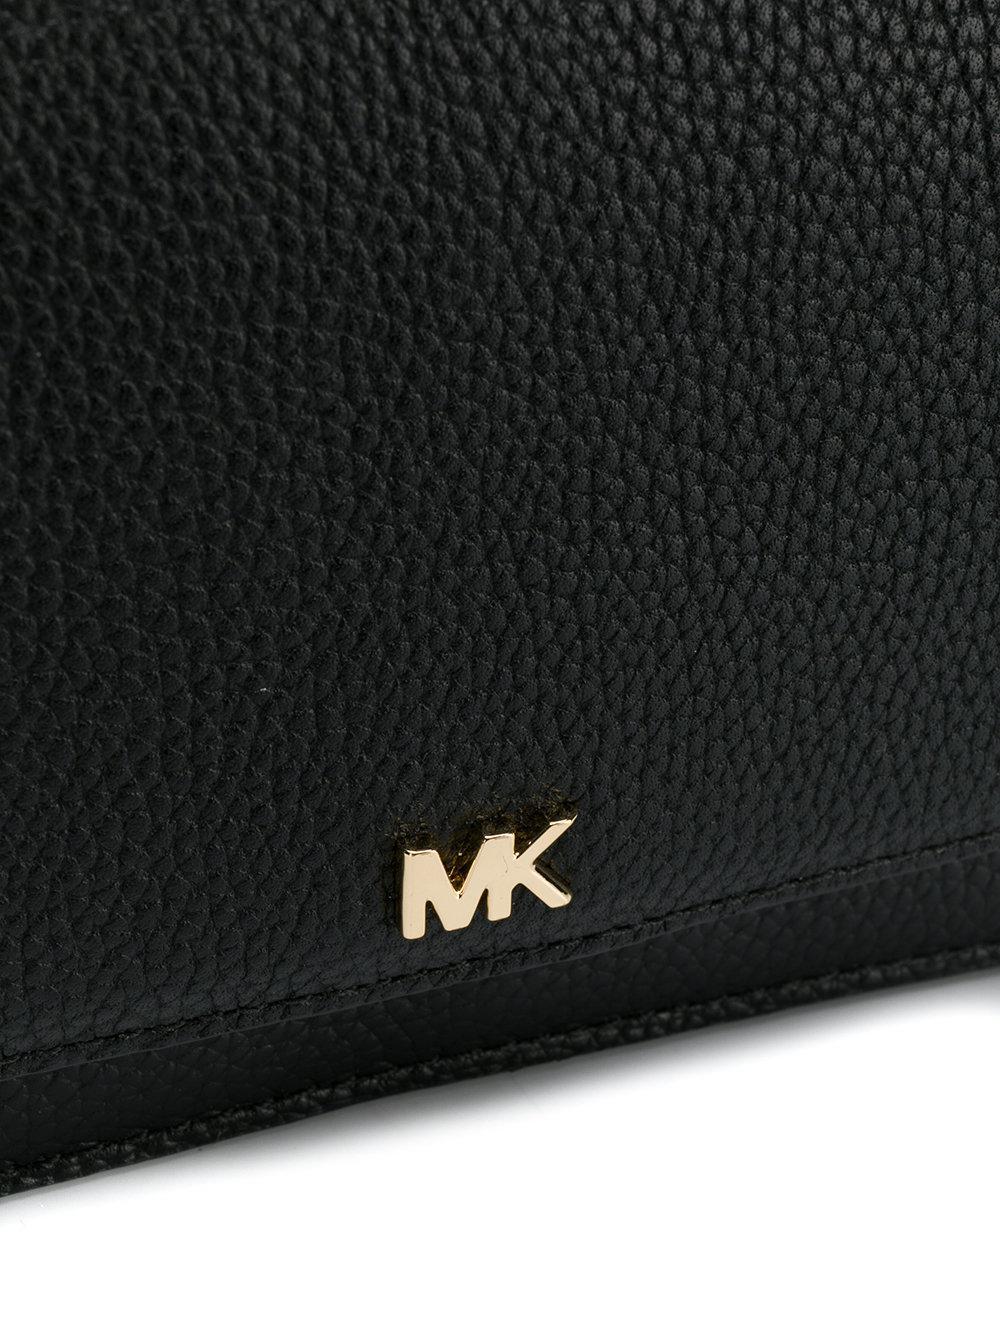 Michael Kors Leather Pebble Convertible Crossbody in Black